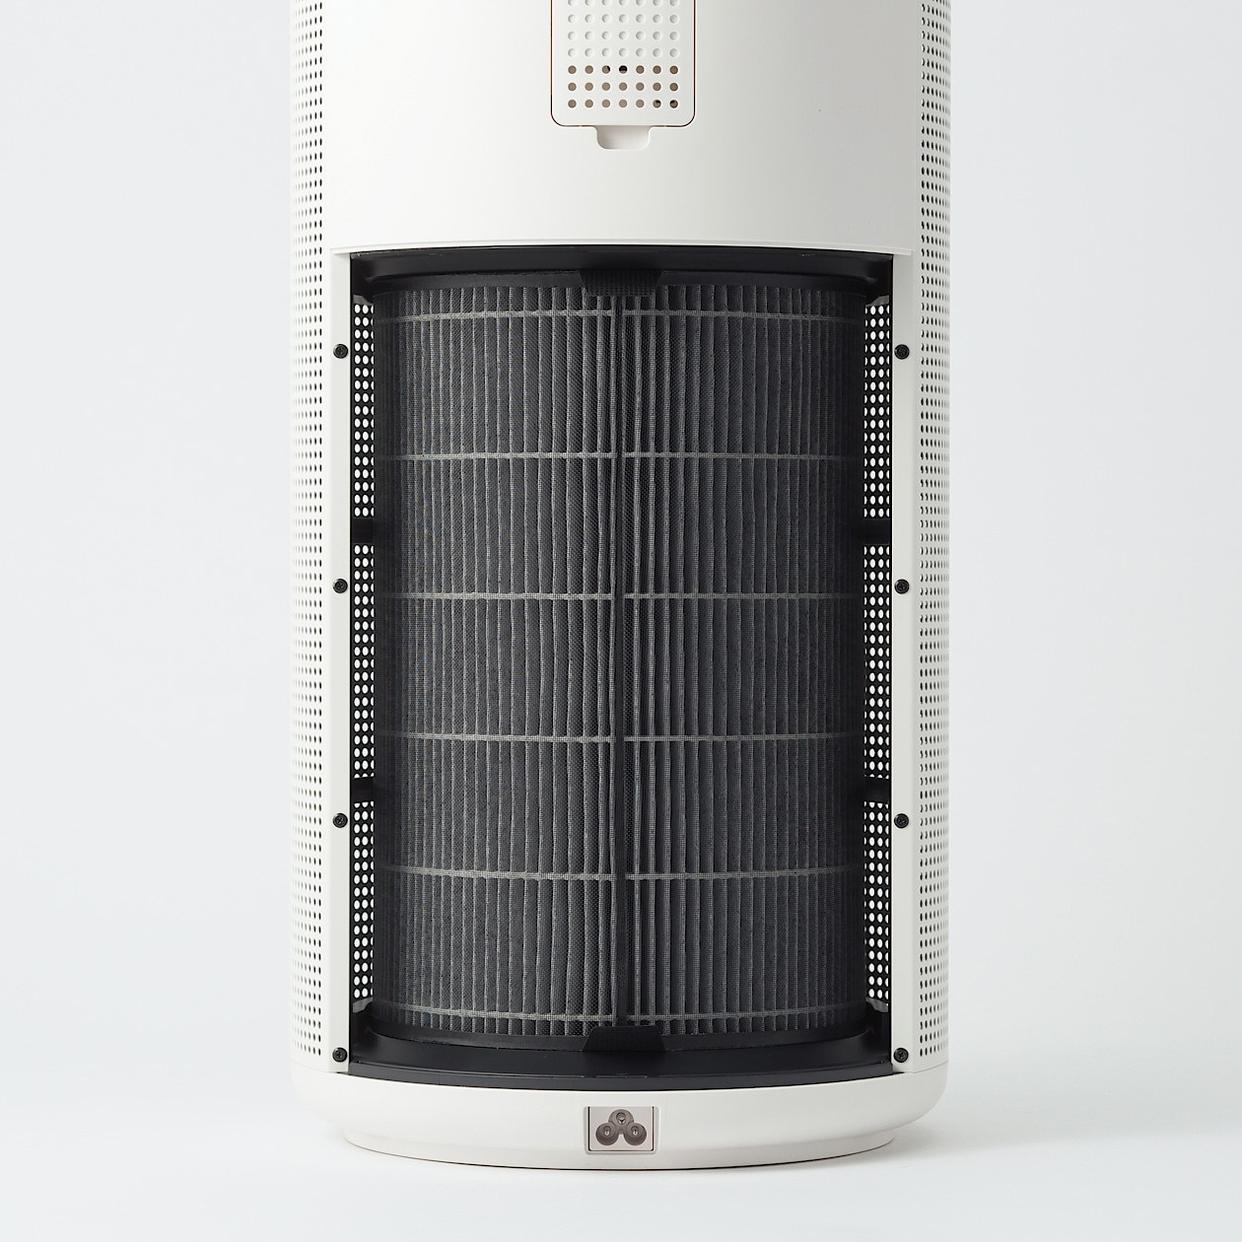 無印良品(MUJI) 空気清浄機 MJ-AP1の商品画像11